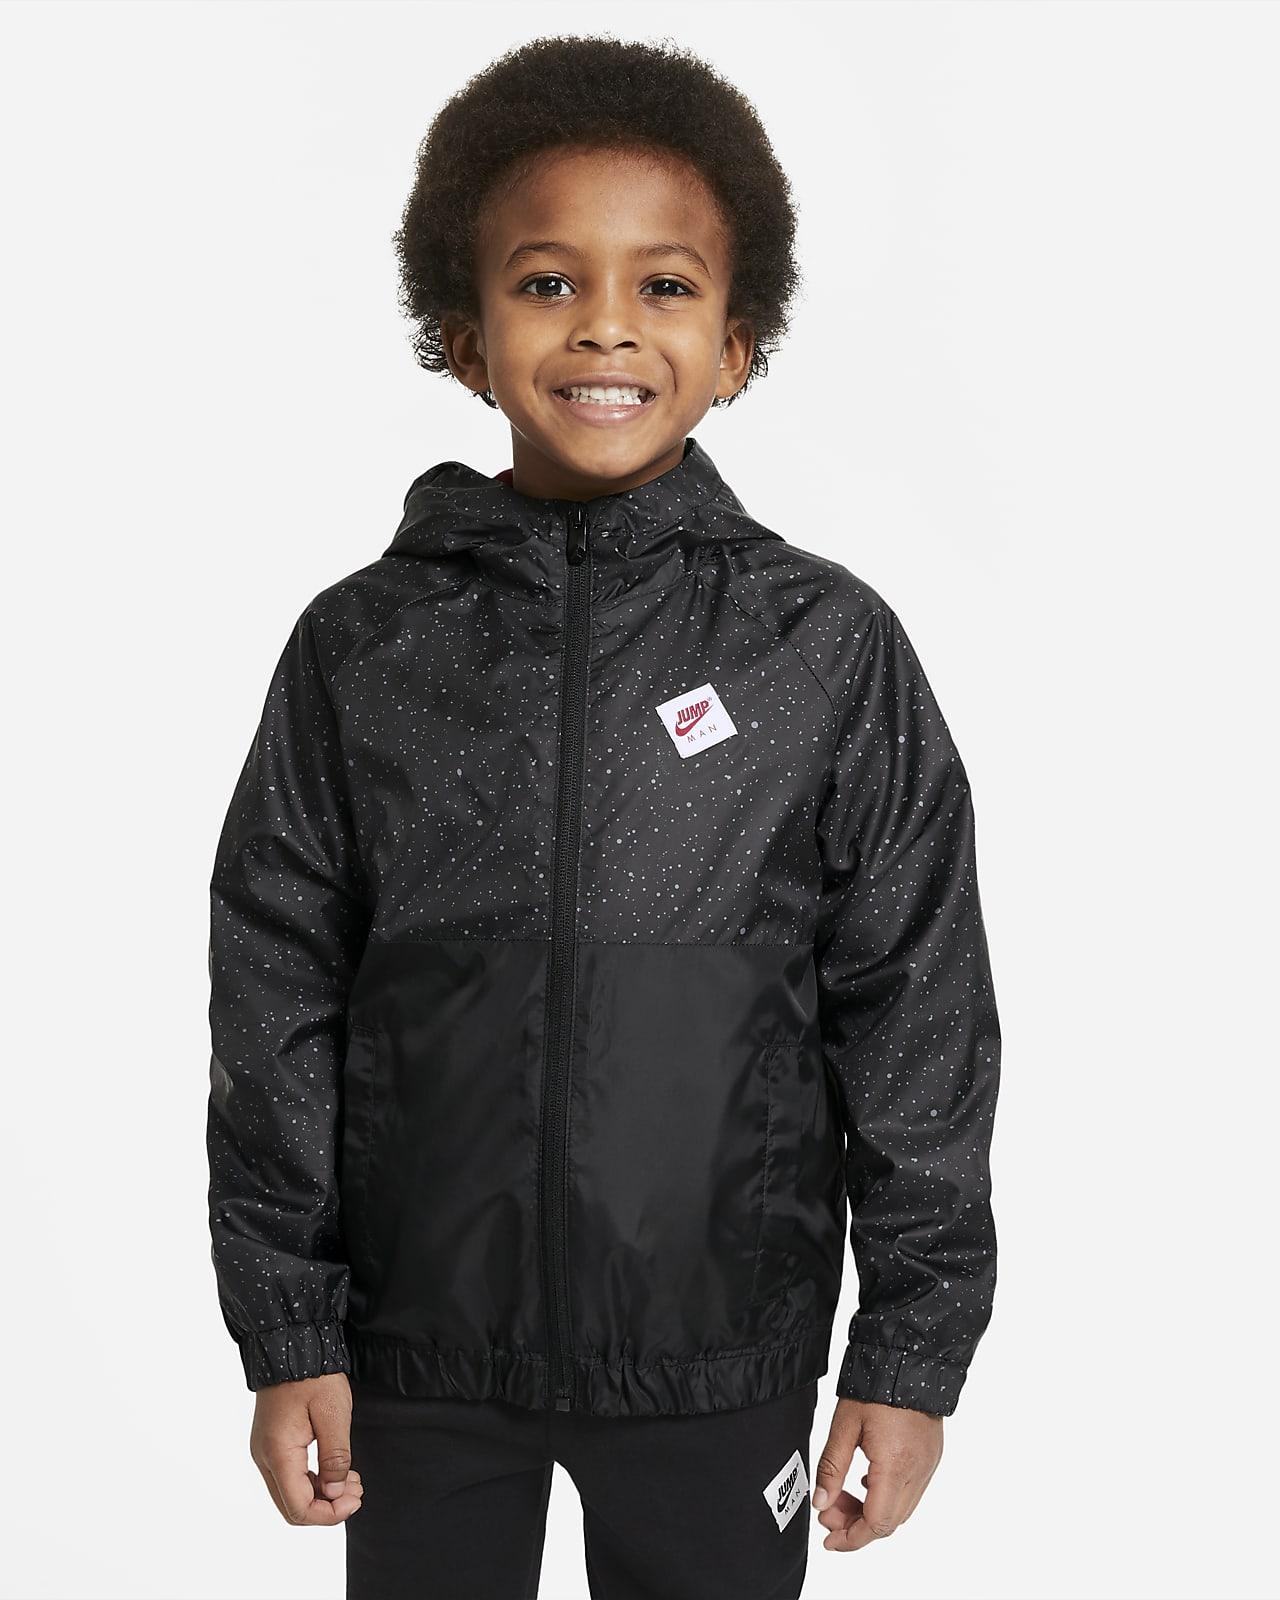 Jordan Younger Kids' Full-Zip Jacket